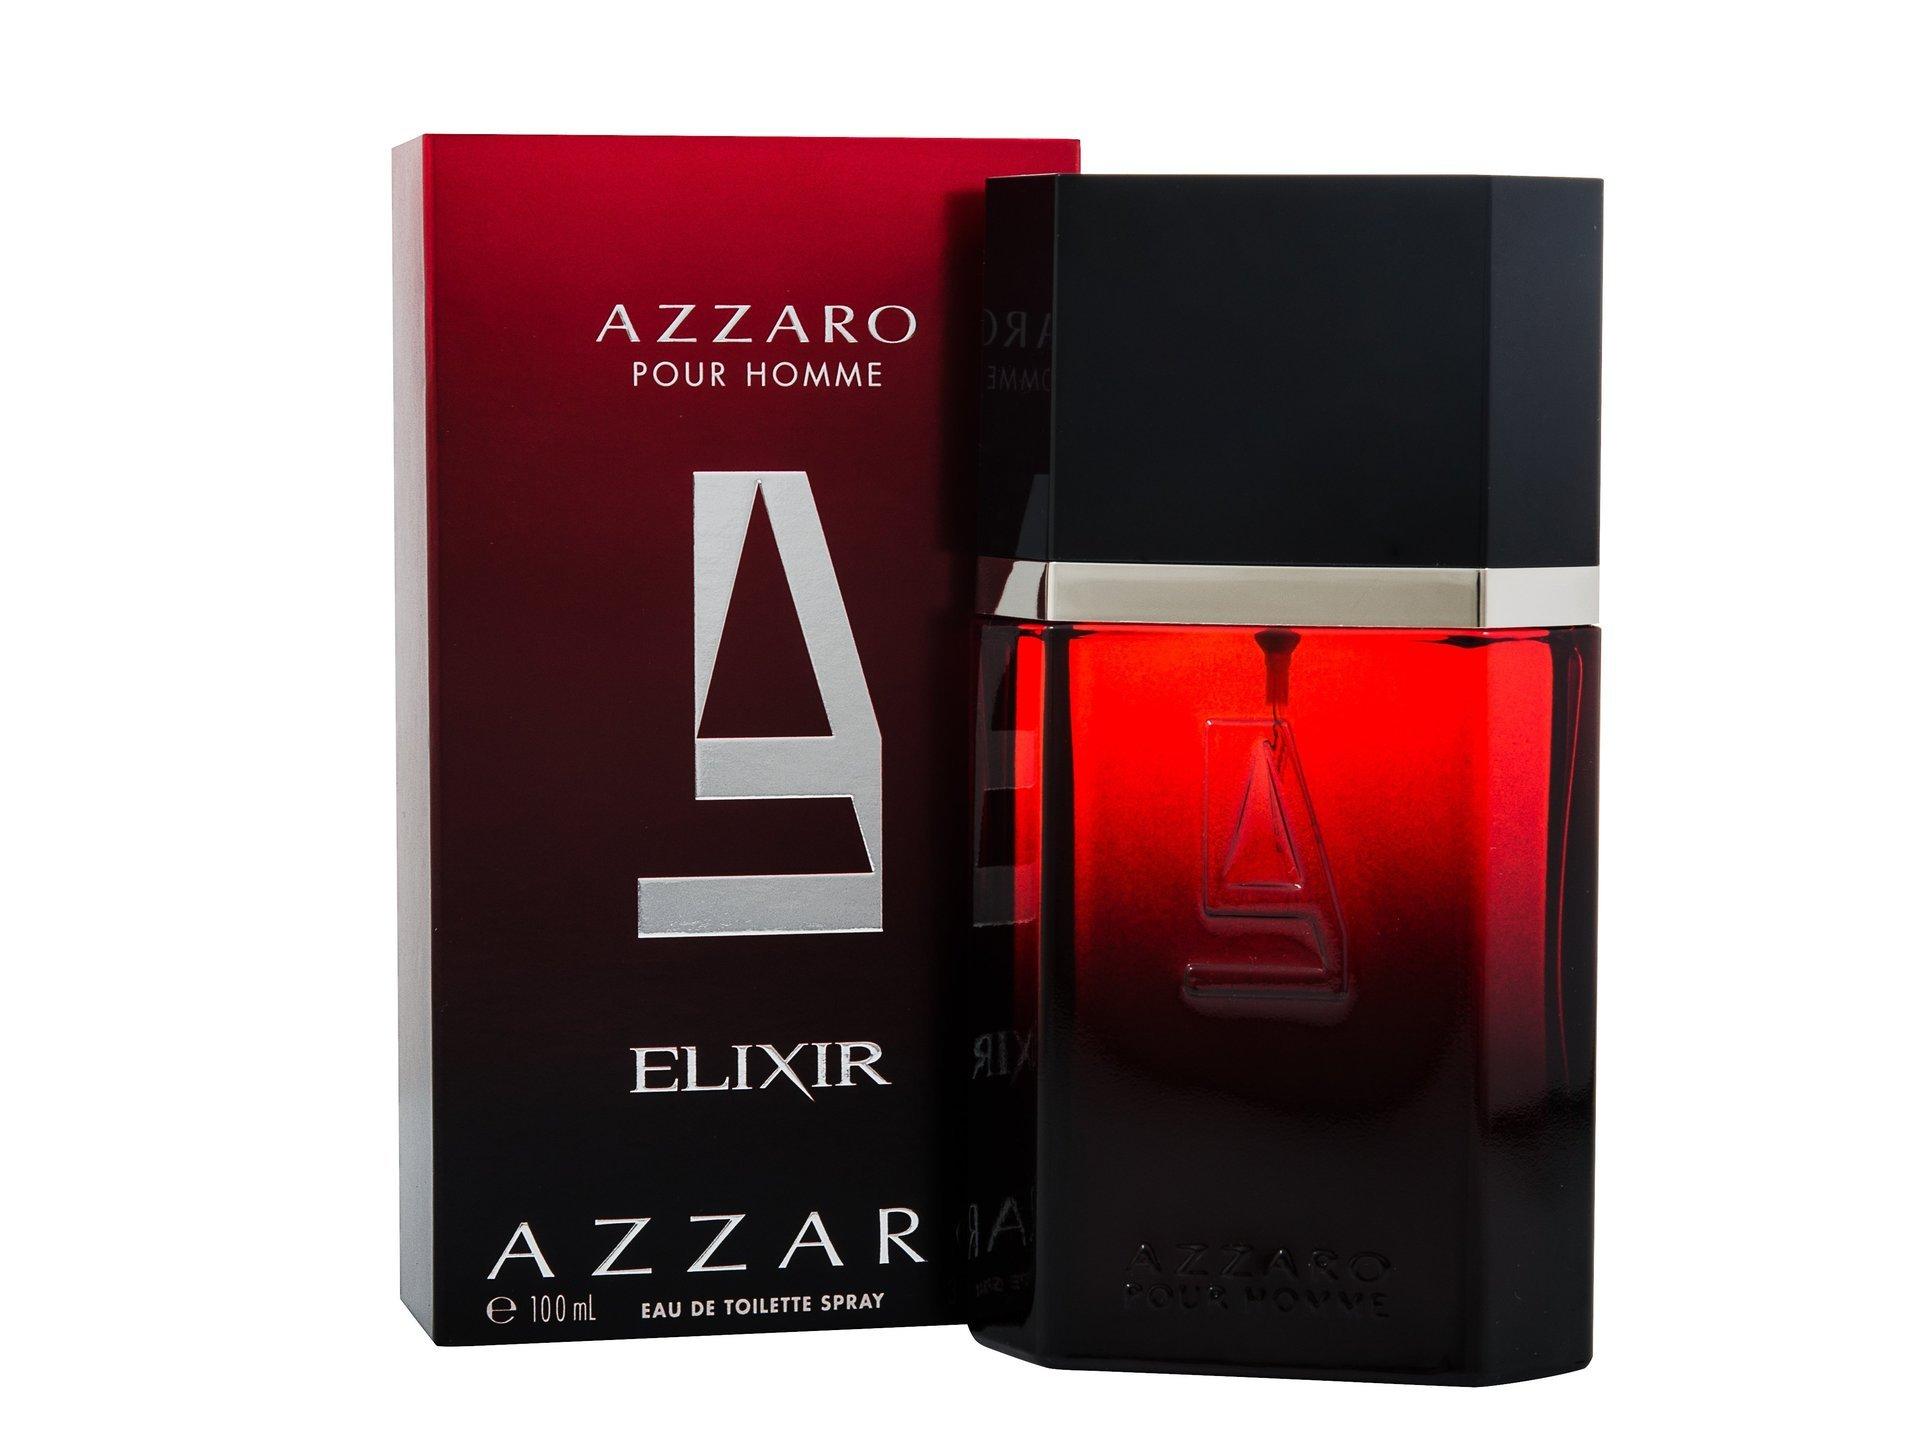 Azzaro Homme Elixir Eau de Toilette 100ml Spray